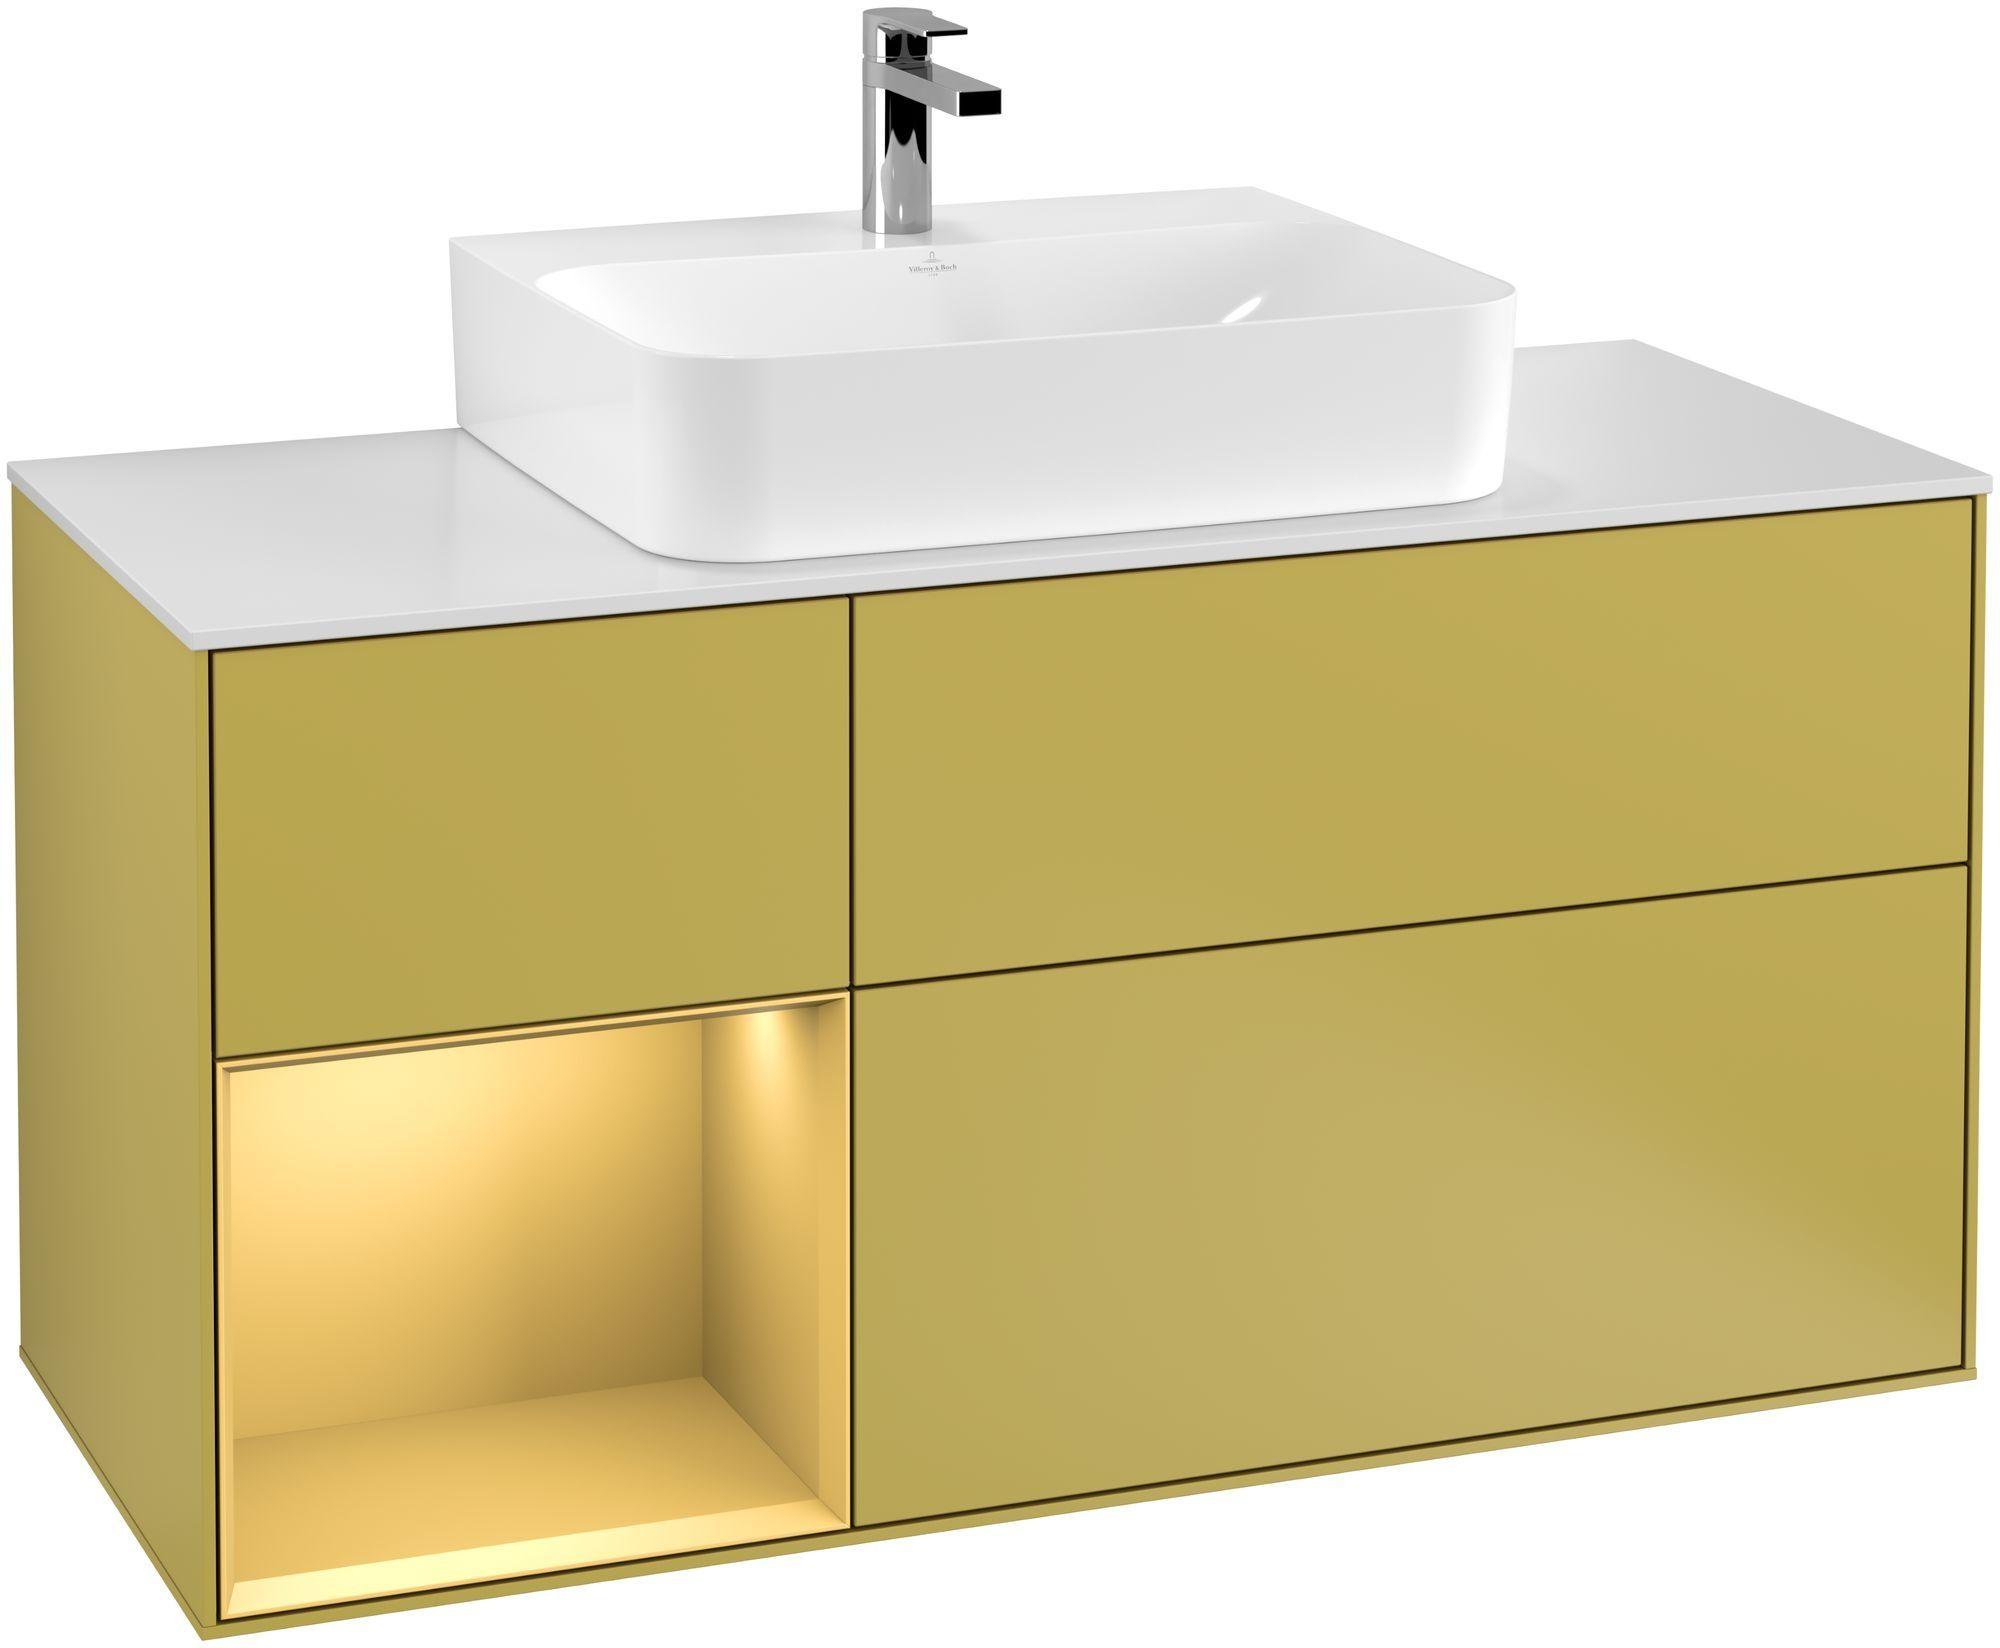 Villeroy & Boch Finion G16 Waschtischunterschrank mit Regalelement 3 Auszüge Waschtisch mittig LED-Beleuchtung B:120xH:60,3xT:50,1cm Front, Korpus: Sun, Regal: Gold Matt, Glasplatte: White Matt G161HFHE